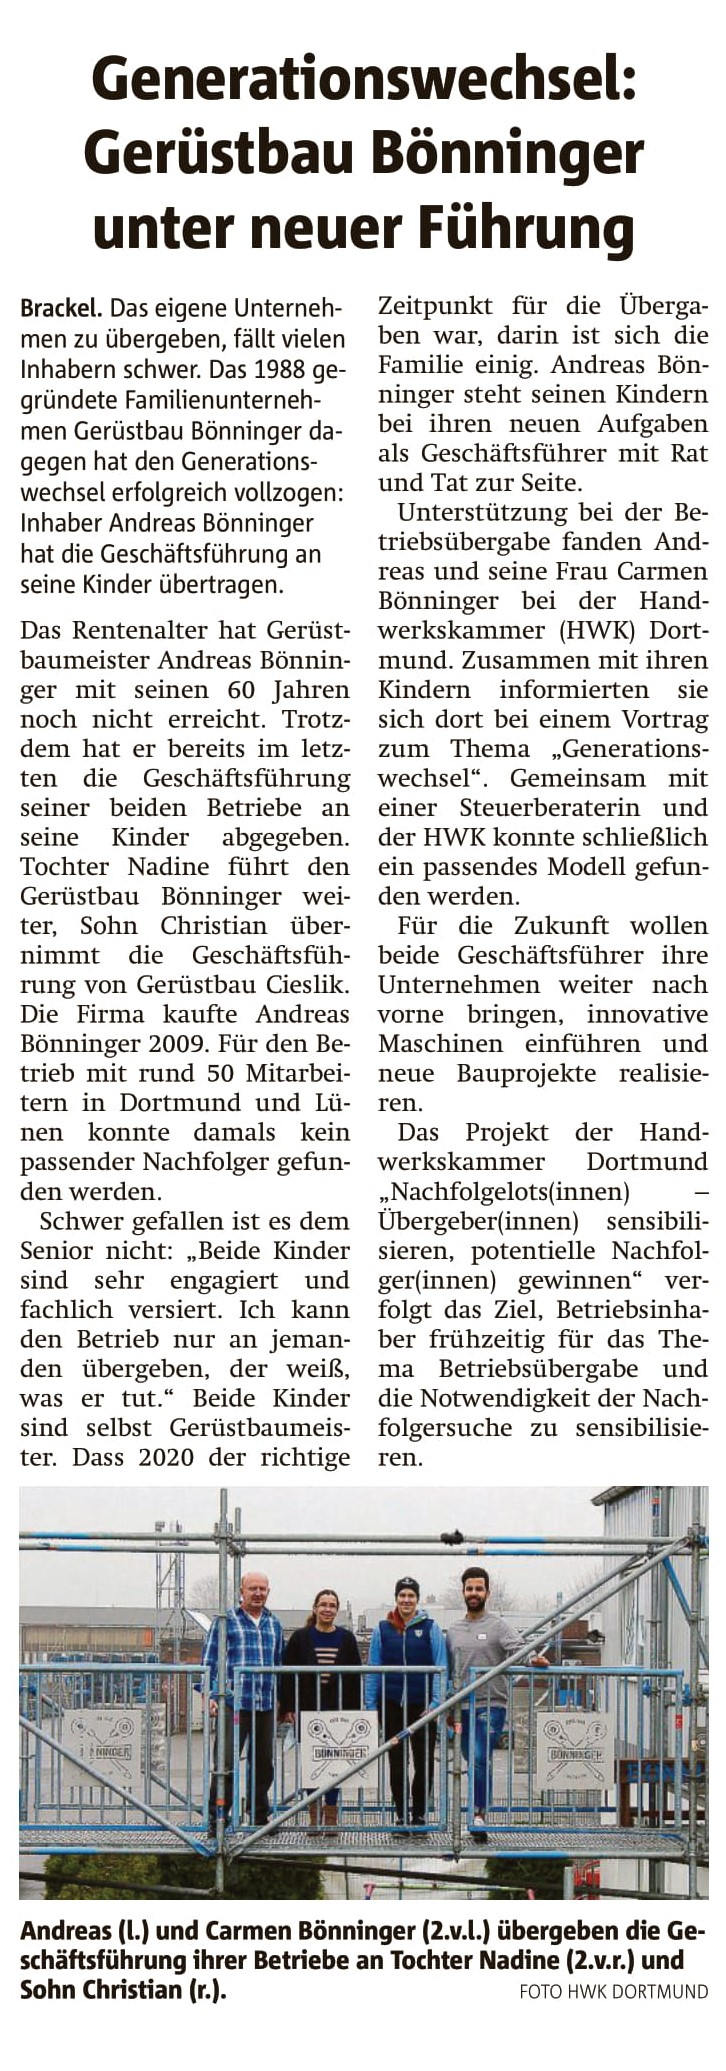 Gerüstbau Bönninger – Dortmund Generationswechsel